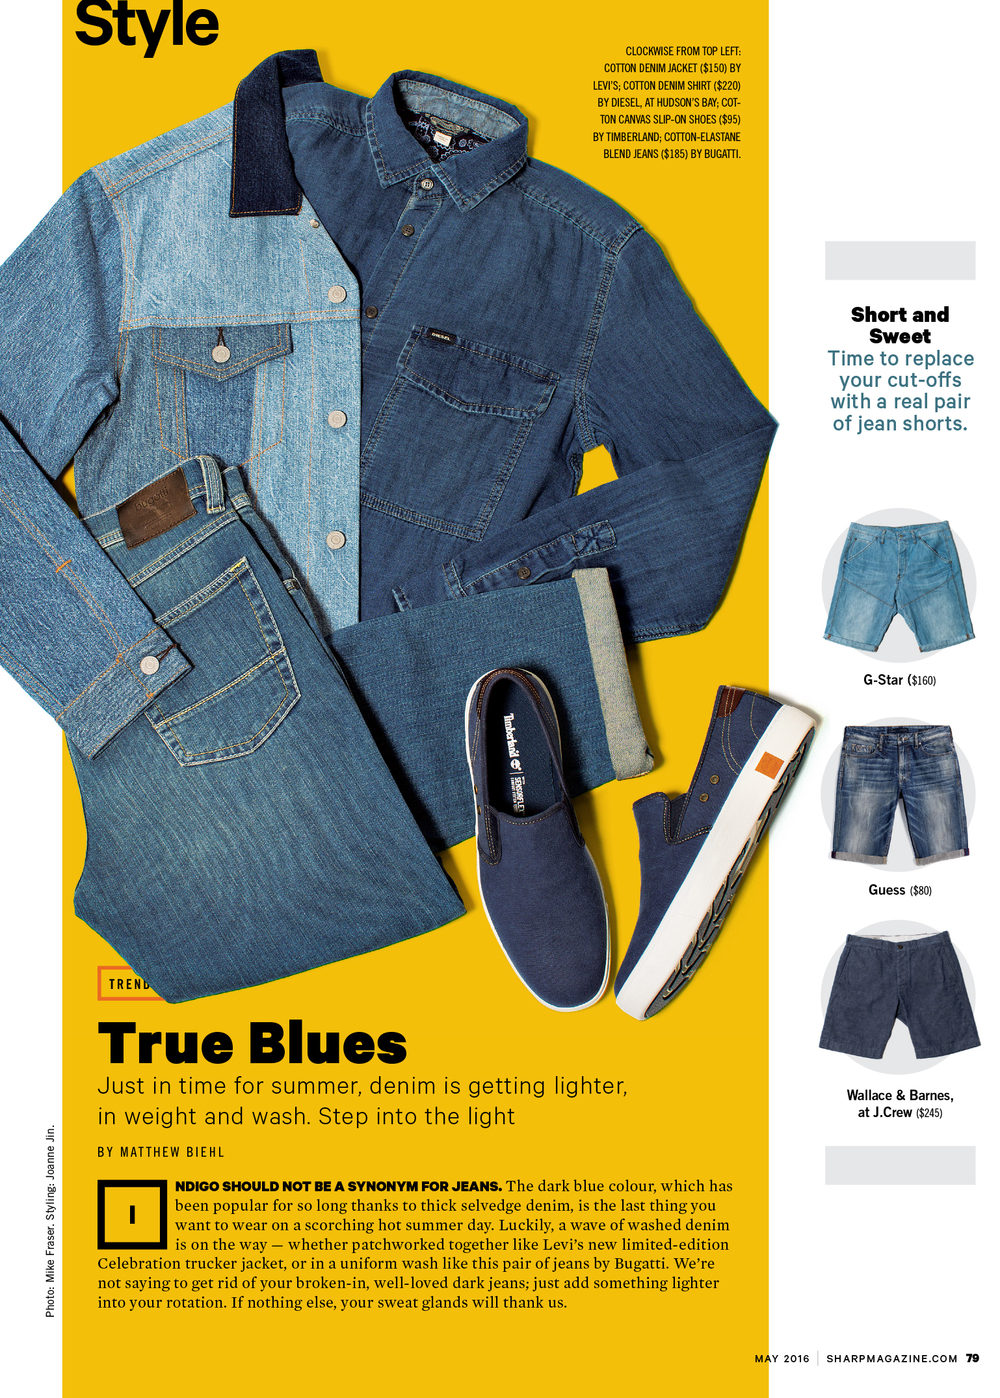 Sharp Magazine / May 2016 Jeans